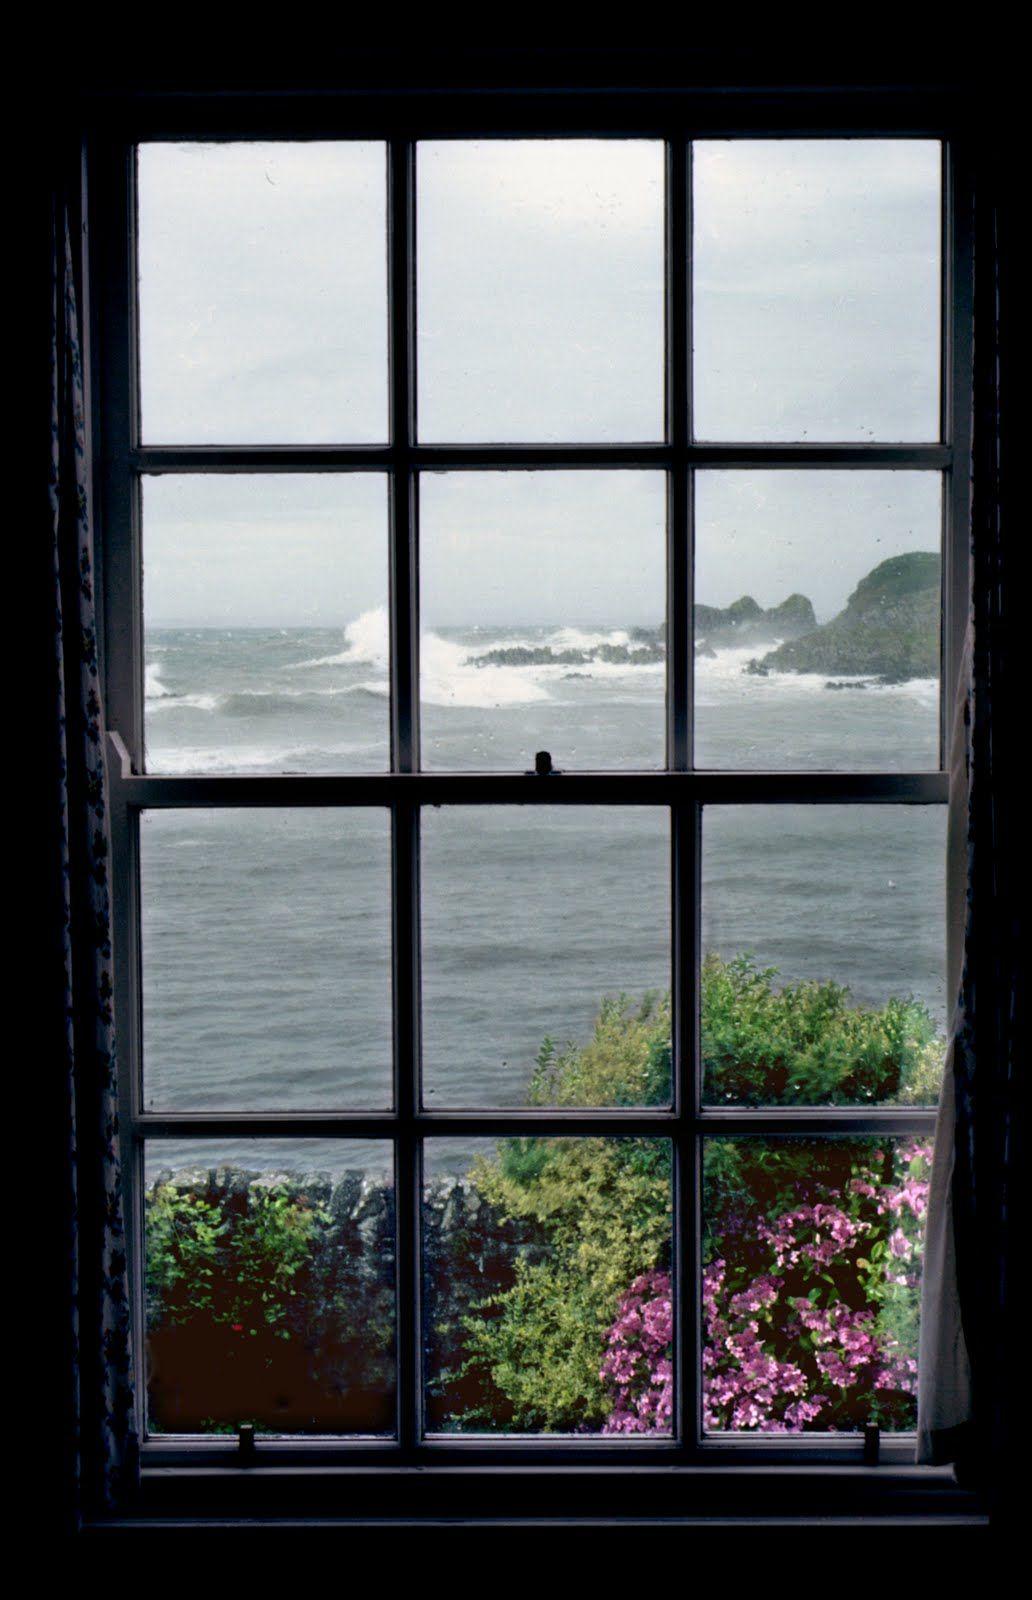 Lou sea through window scenery in pinterest windows sea